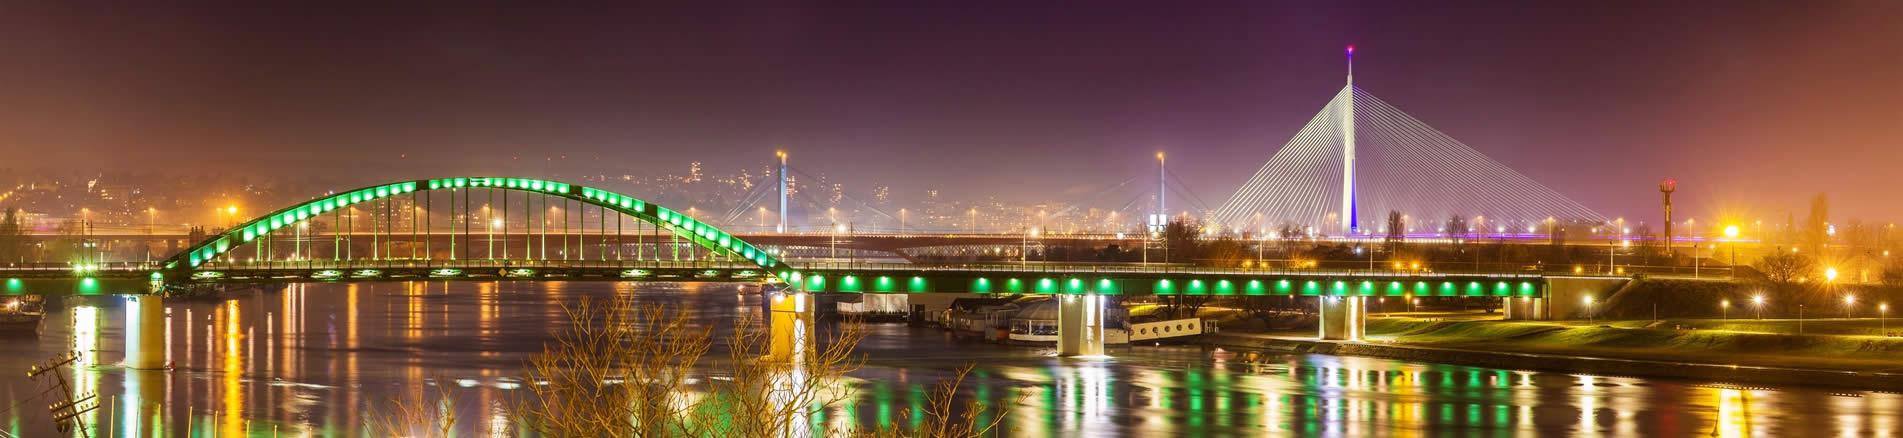 Beograd-mostovi-Panorama